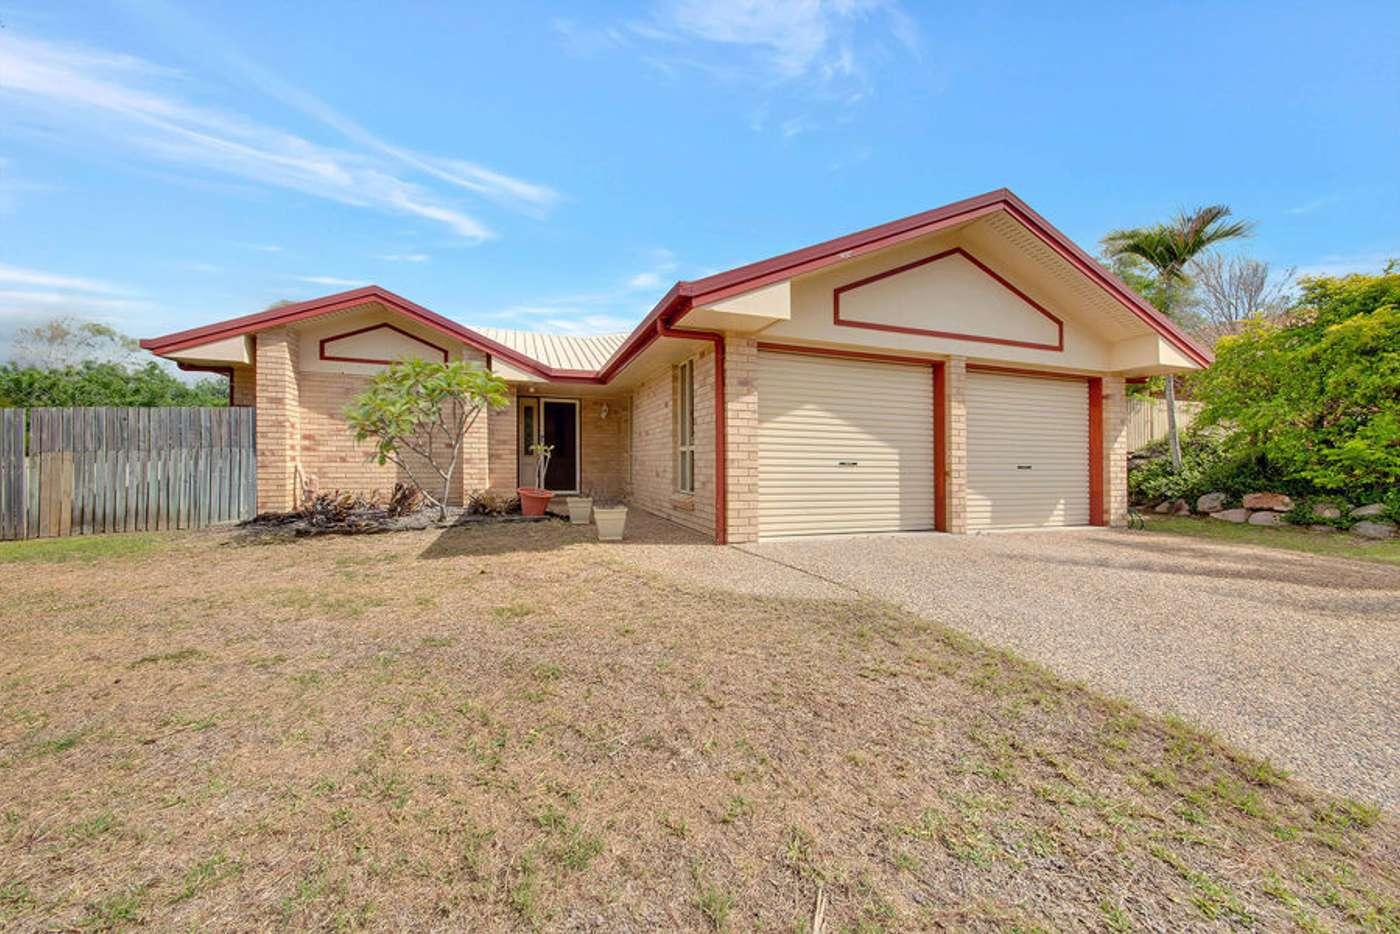 Main view of Homely house listing, 32 Brin Street, Boyne Island QLD 4680